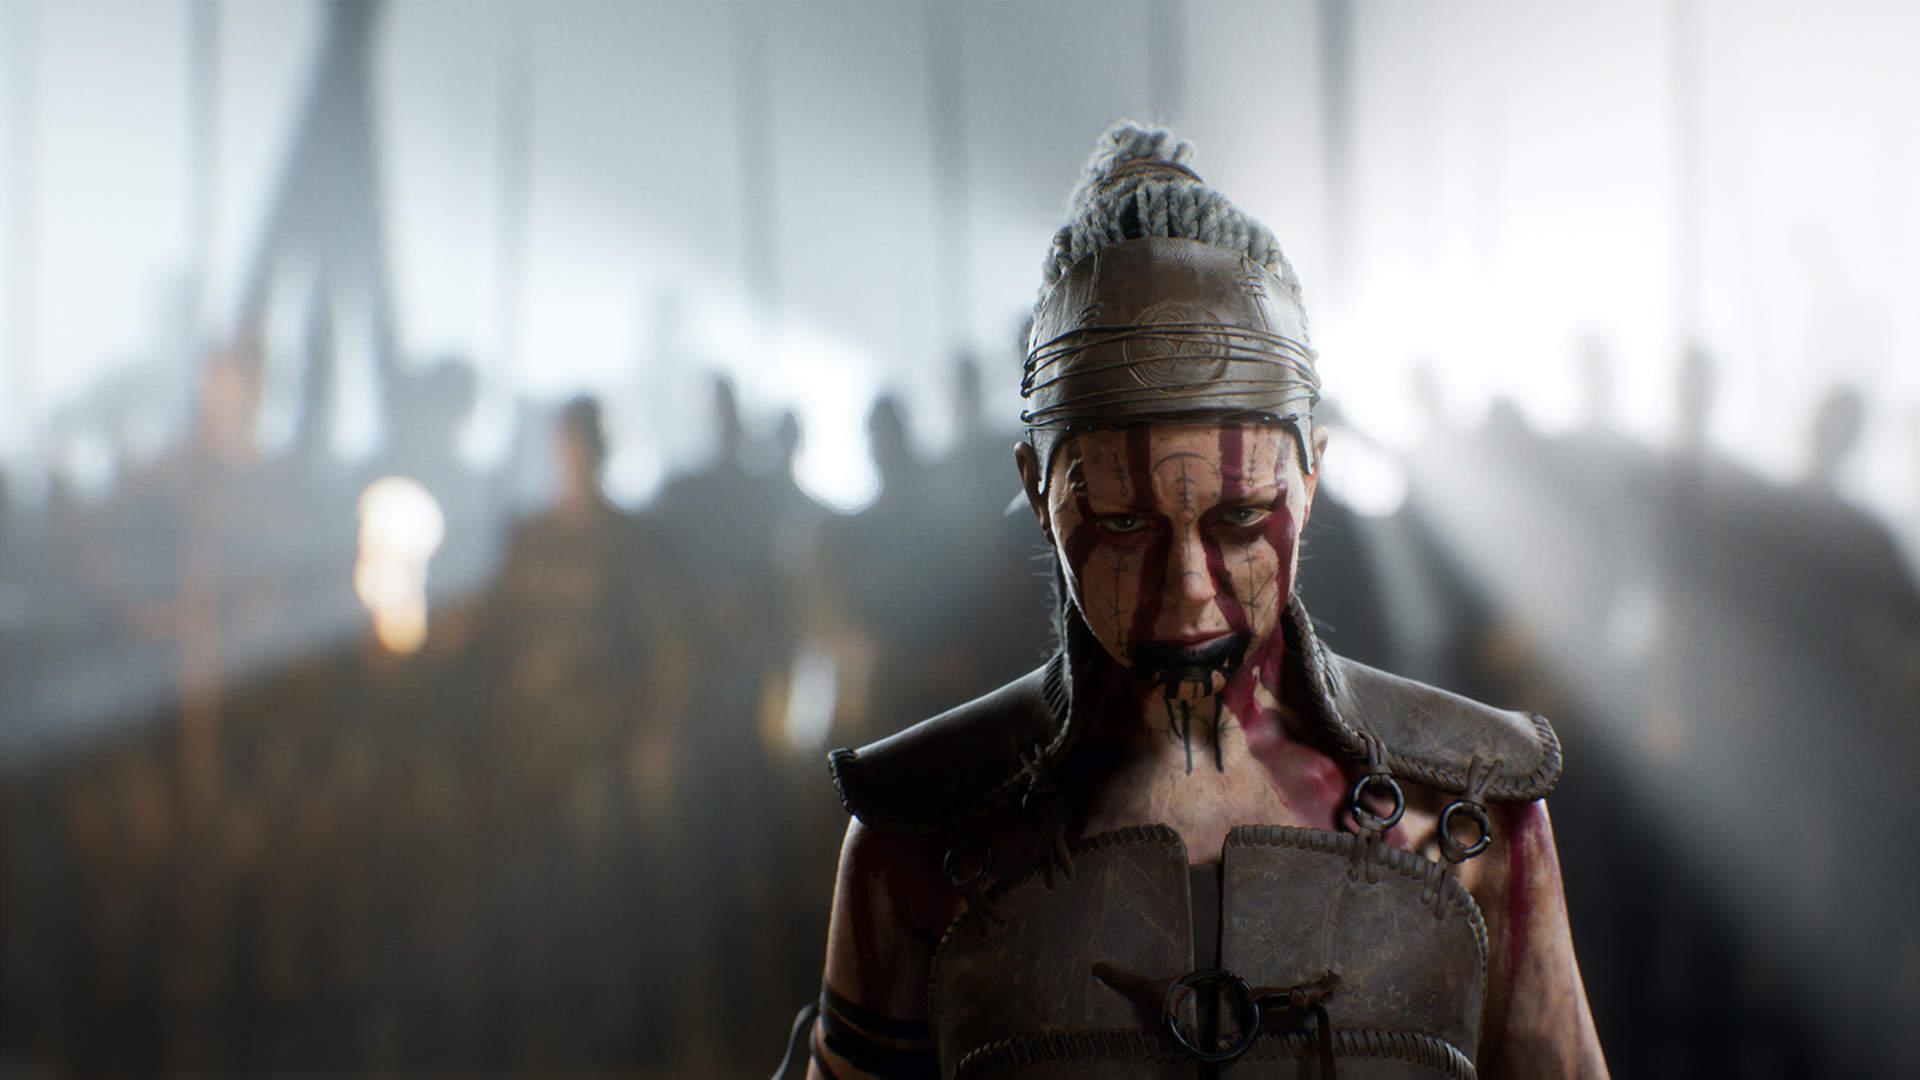 senuas saga hellblade 2 will be an unreal engine 5 game microsoft conf